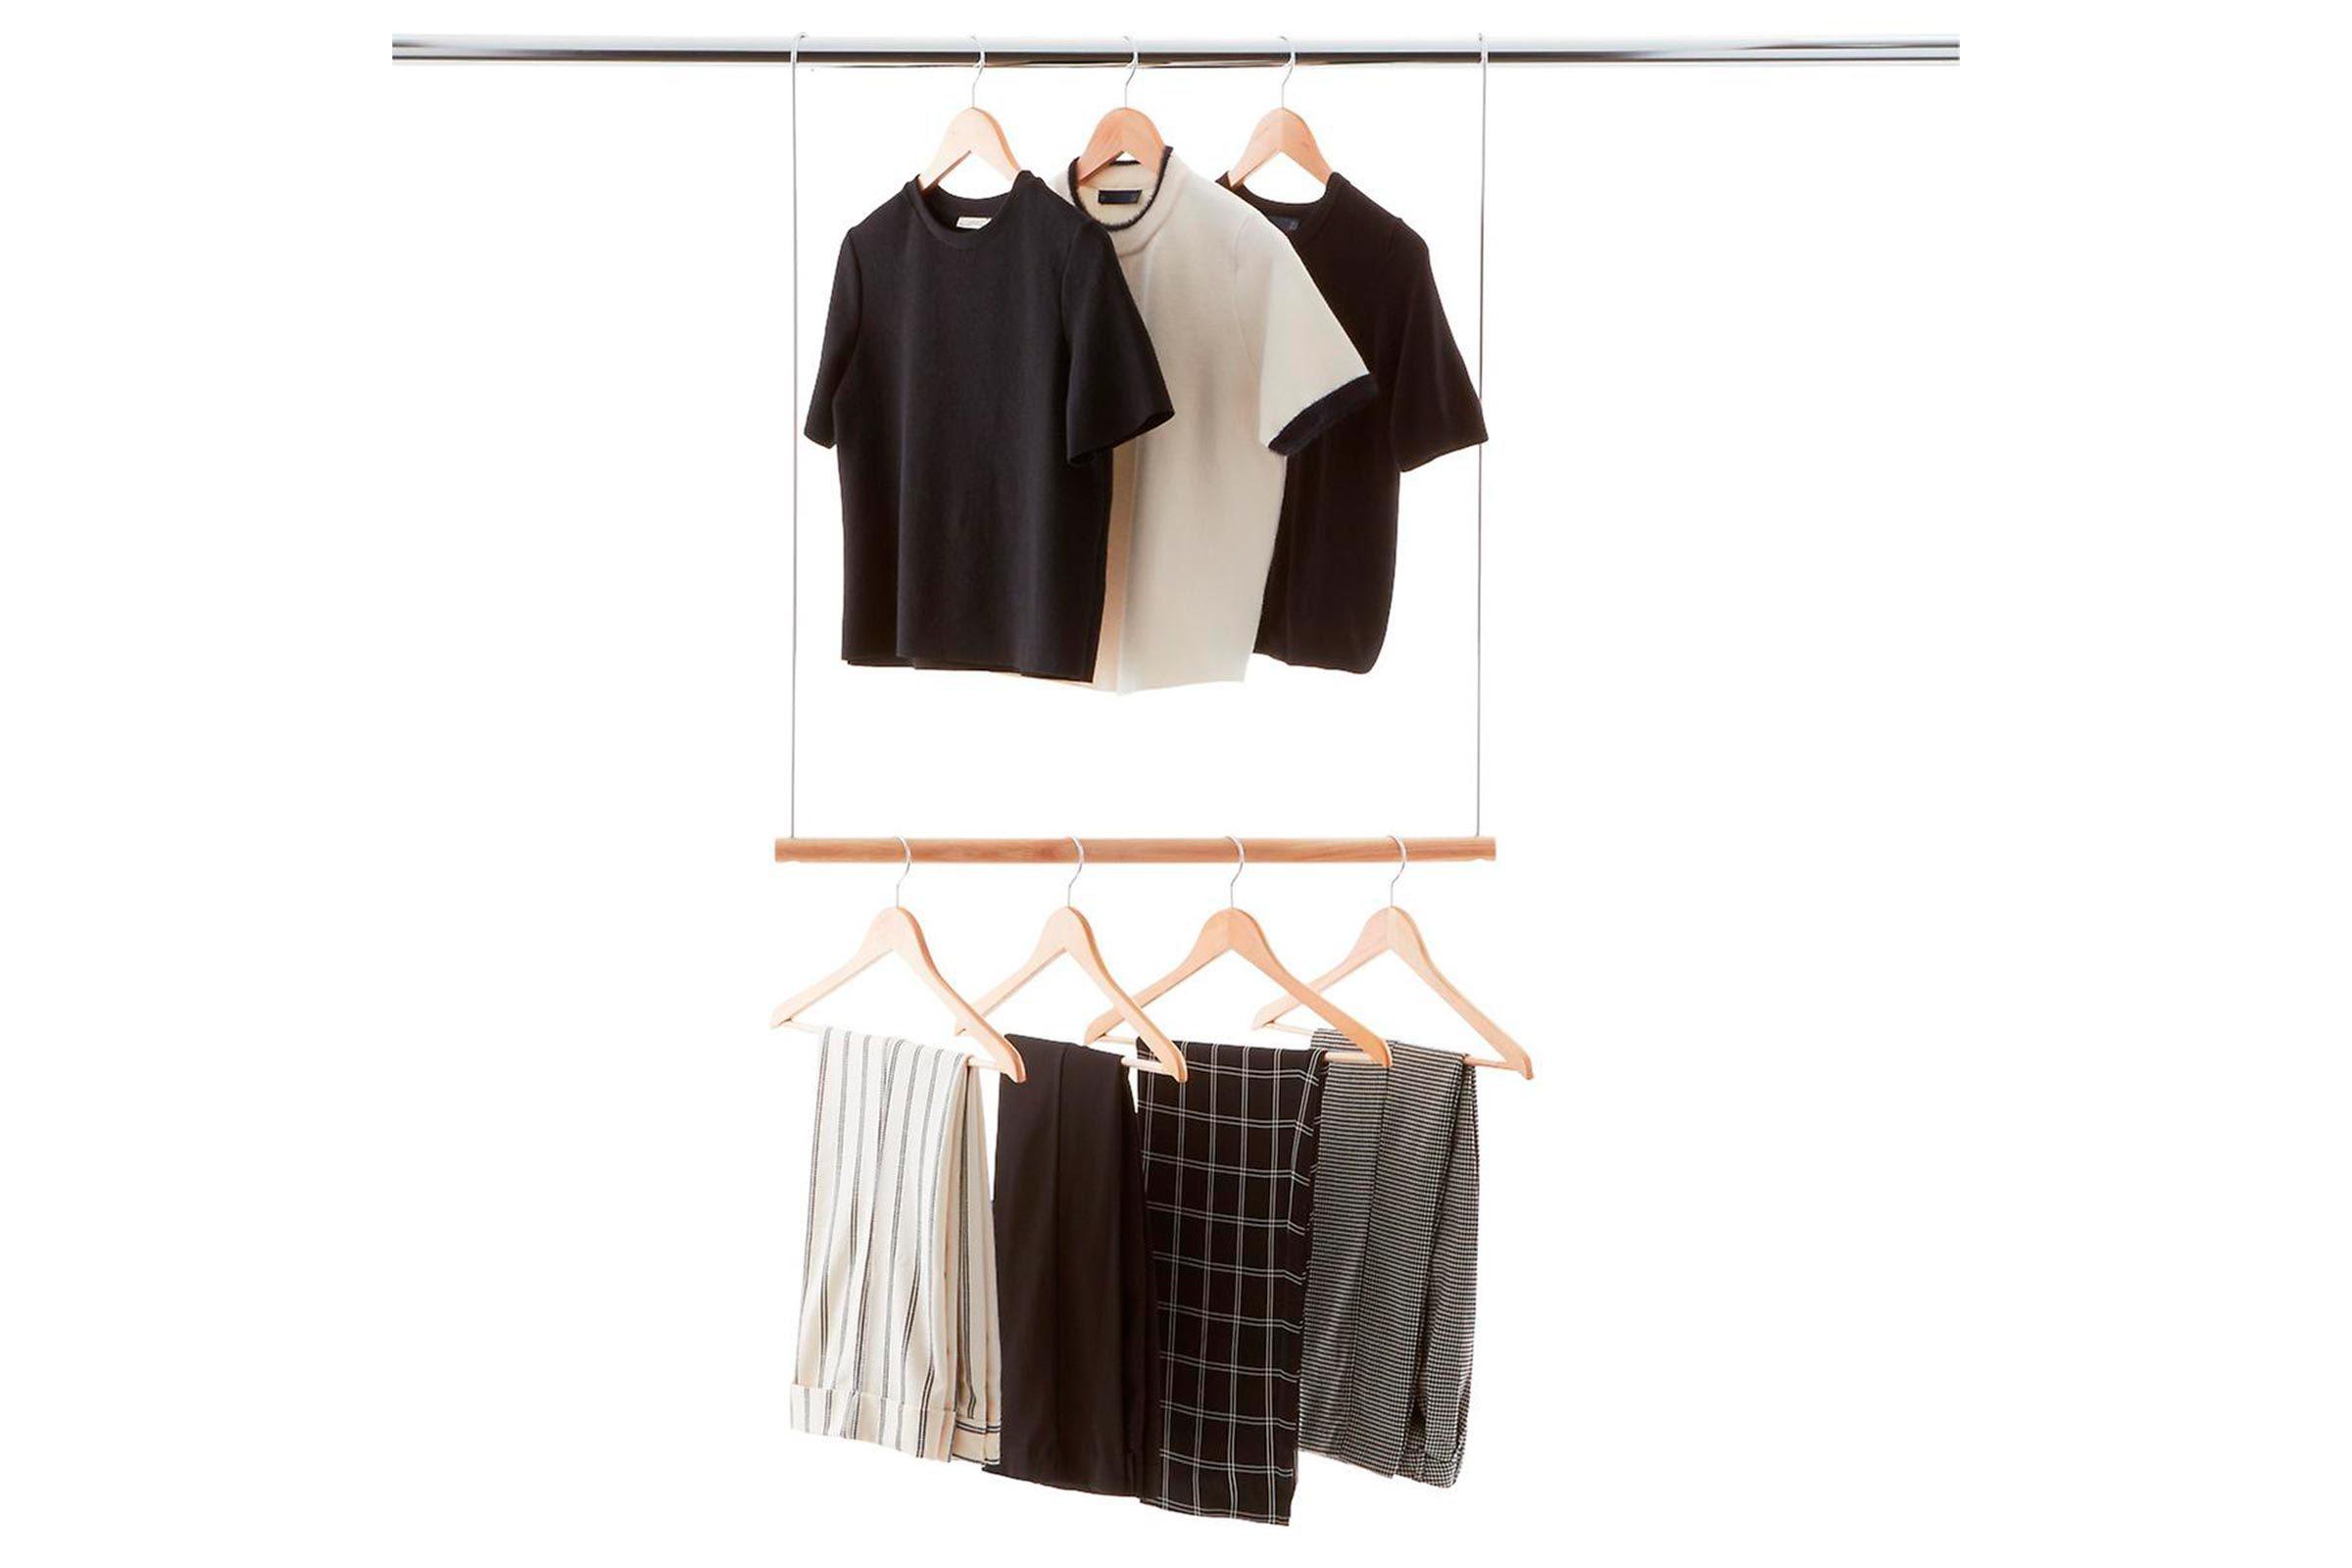 Double hang closet rod